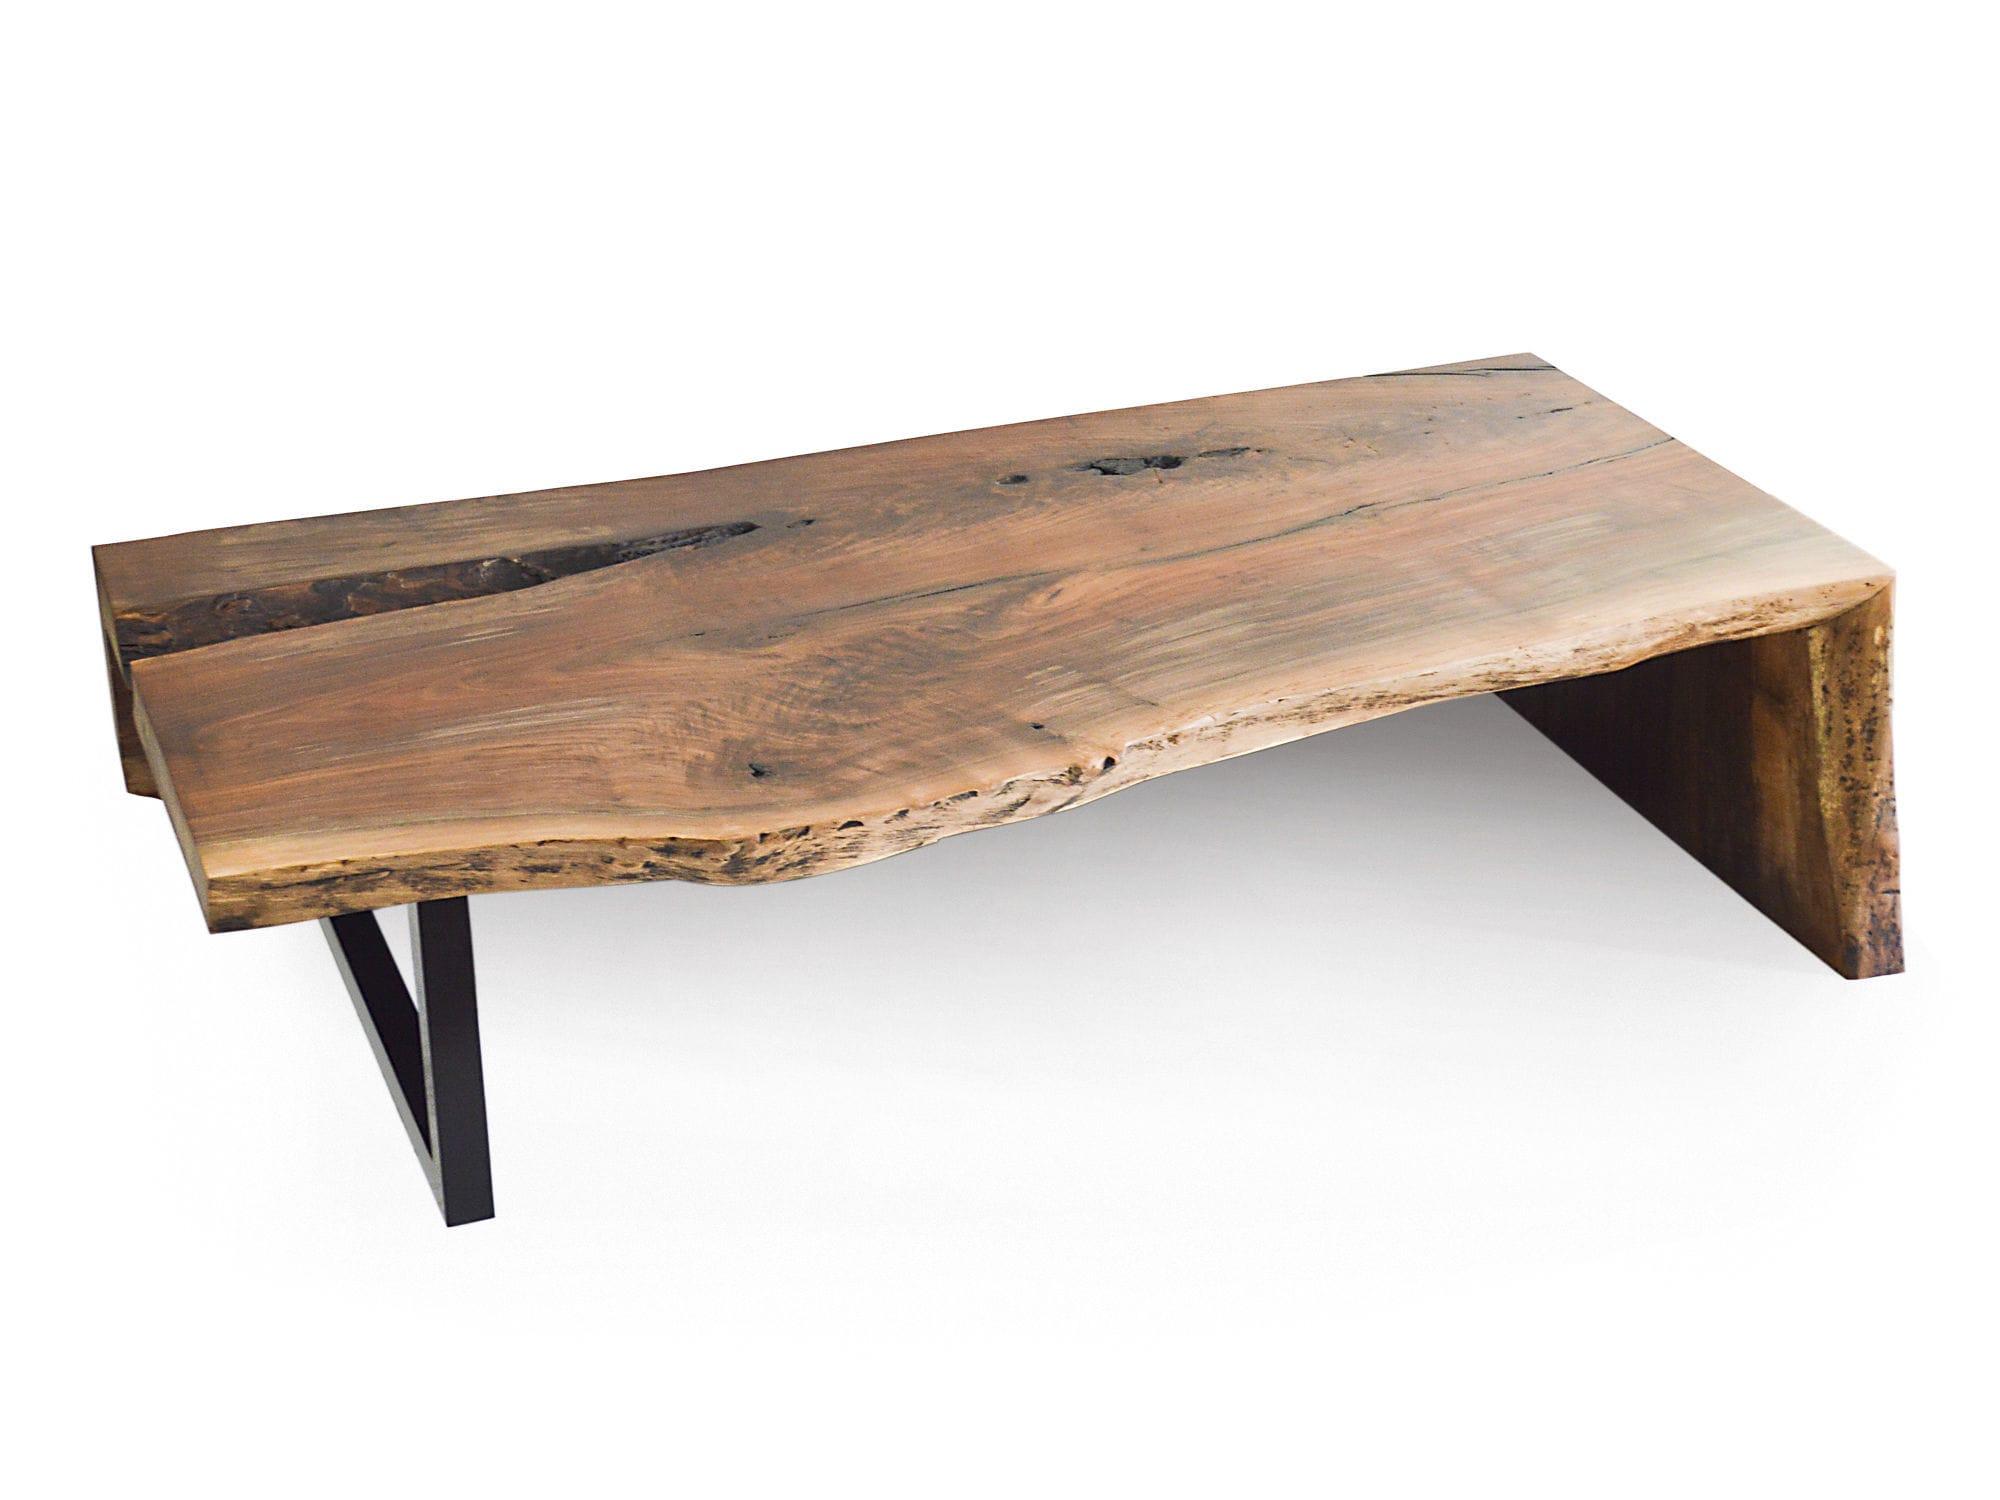 Moderner Couchtisch Holz Metall Rechteckig Walnut Rotsen